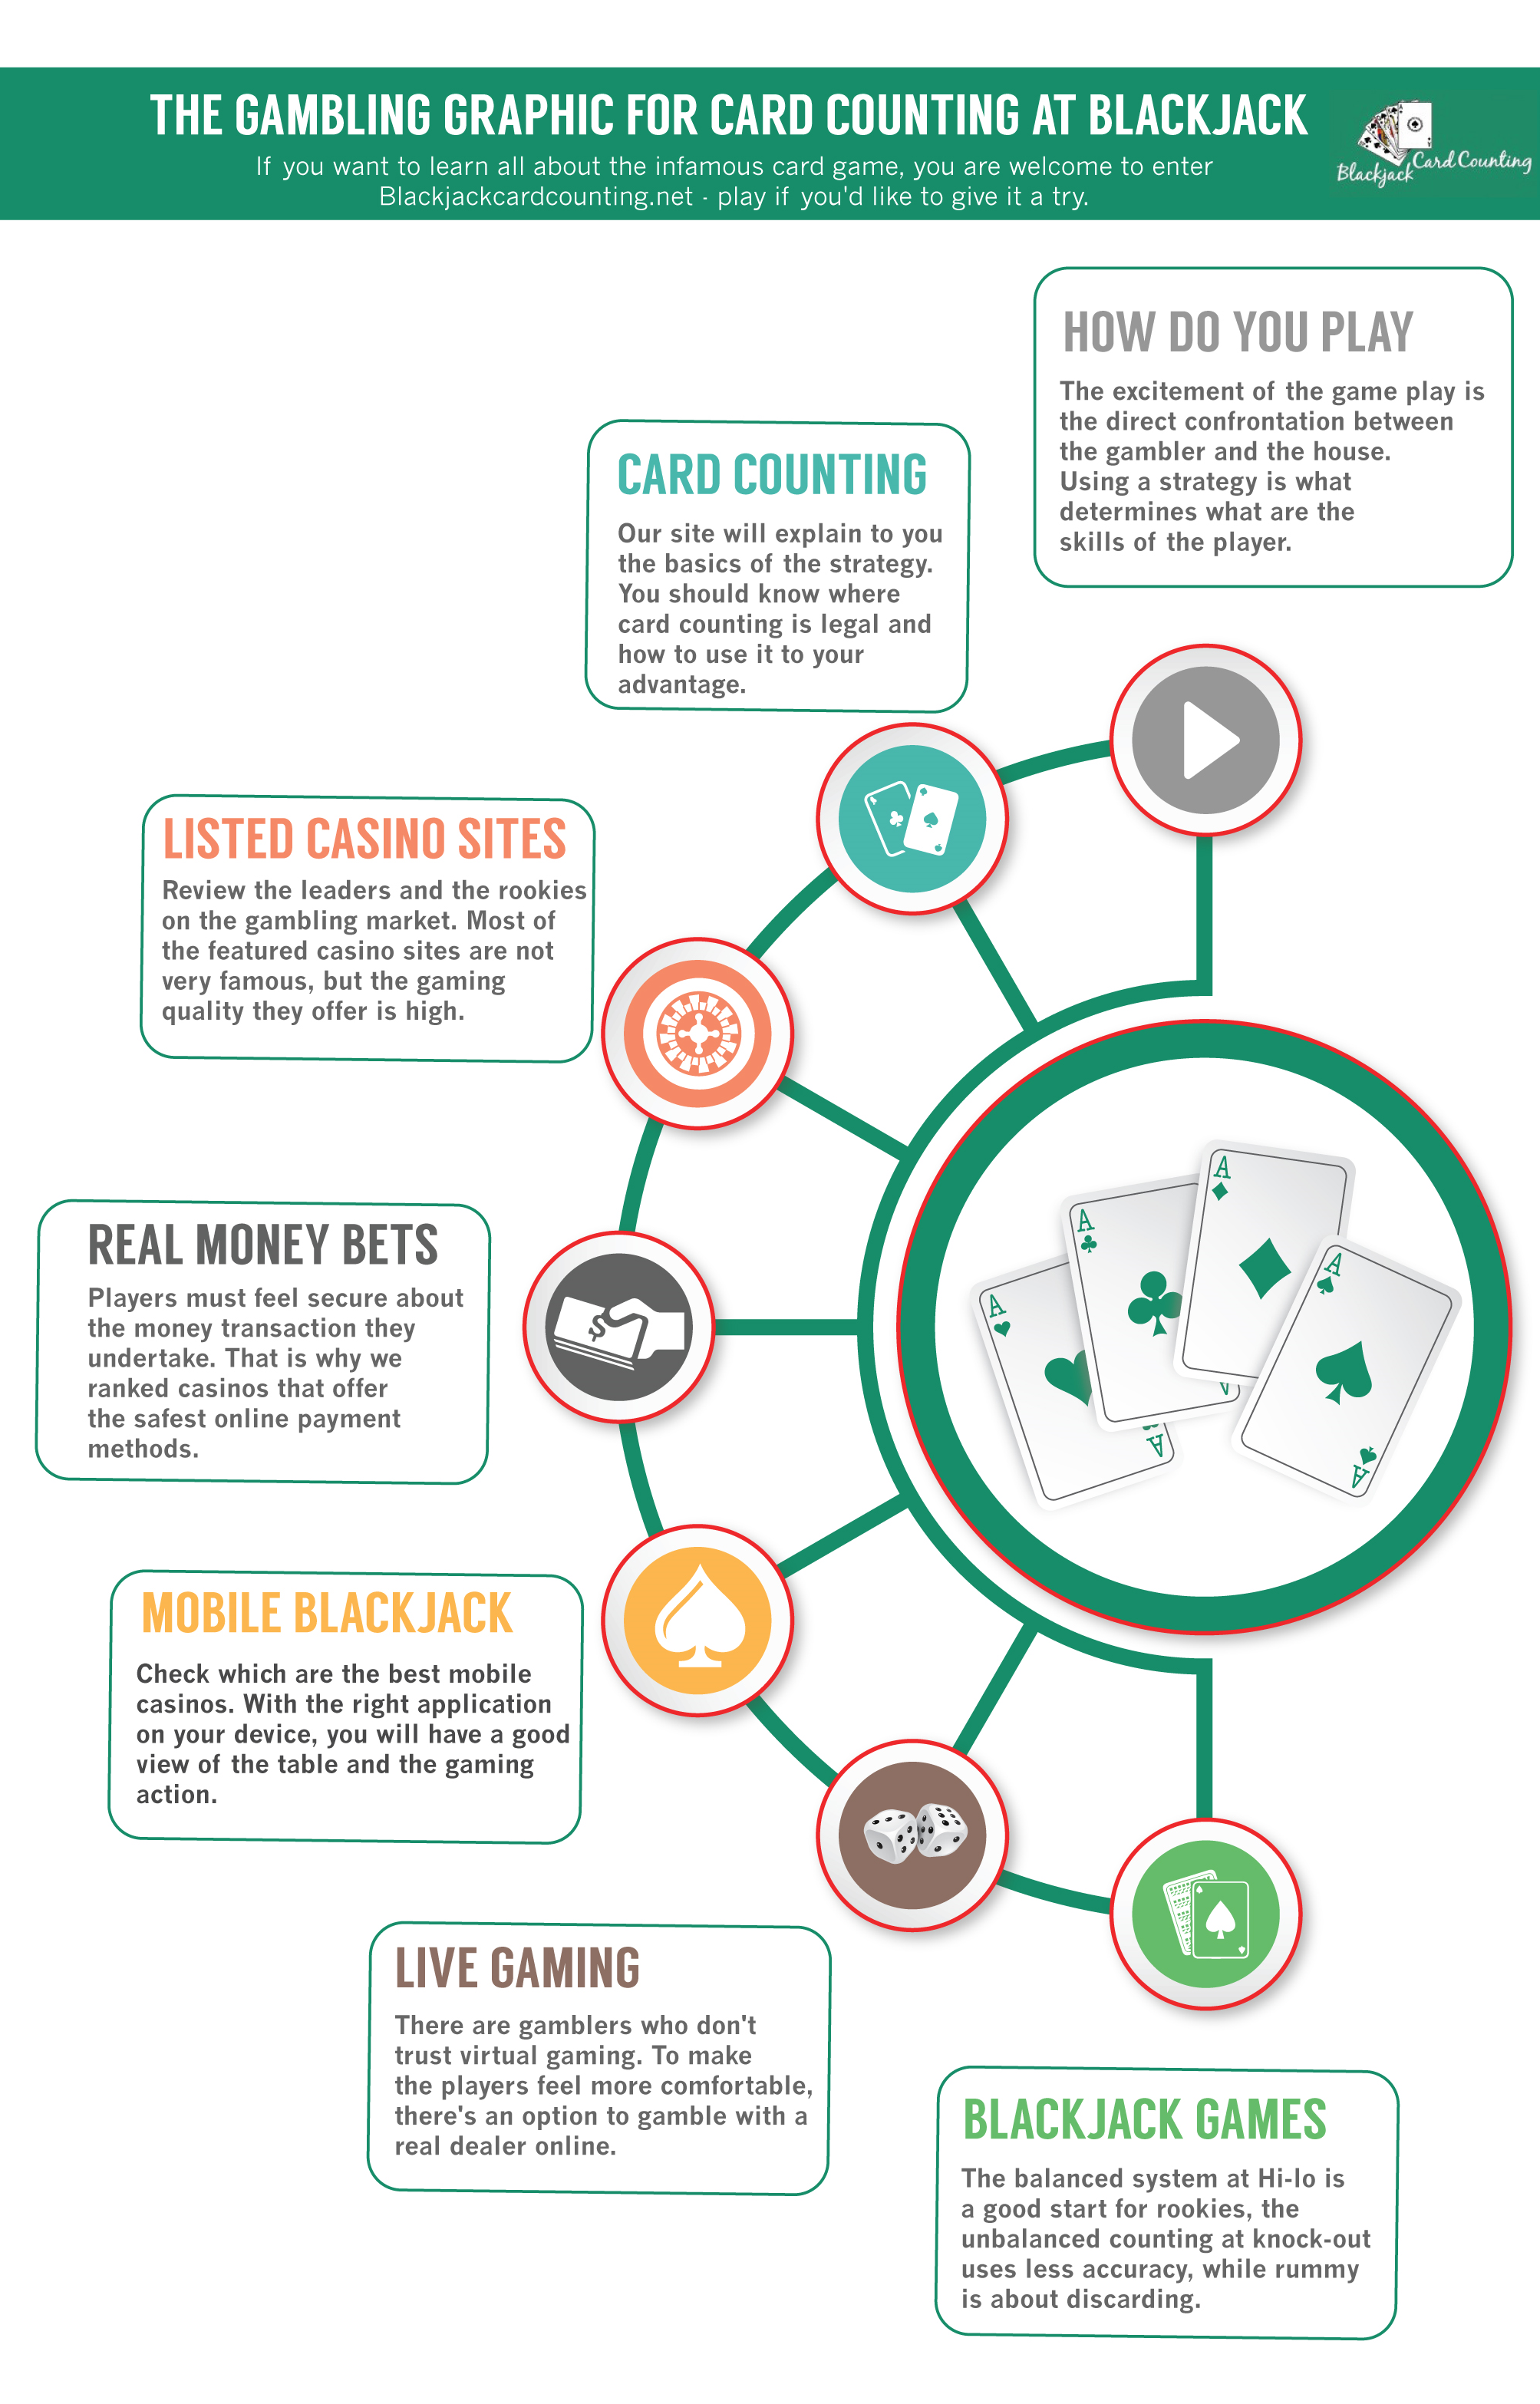 Blackjack Gaming Graphic Blackjack, Gambling, Online